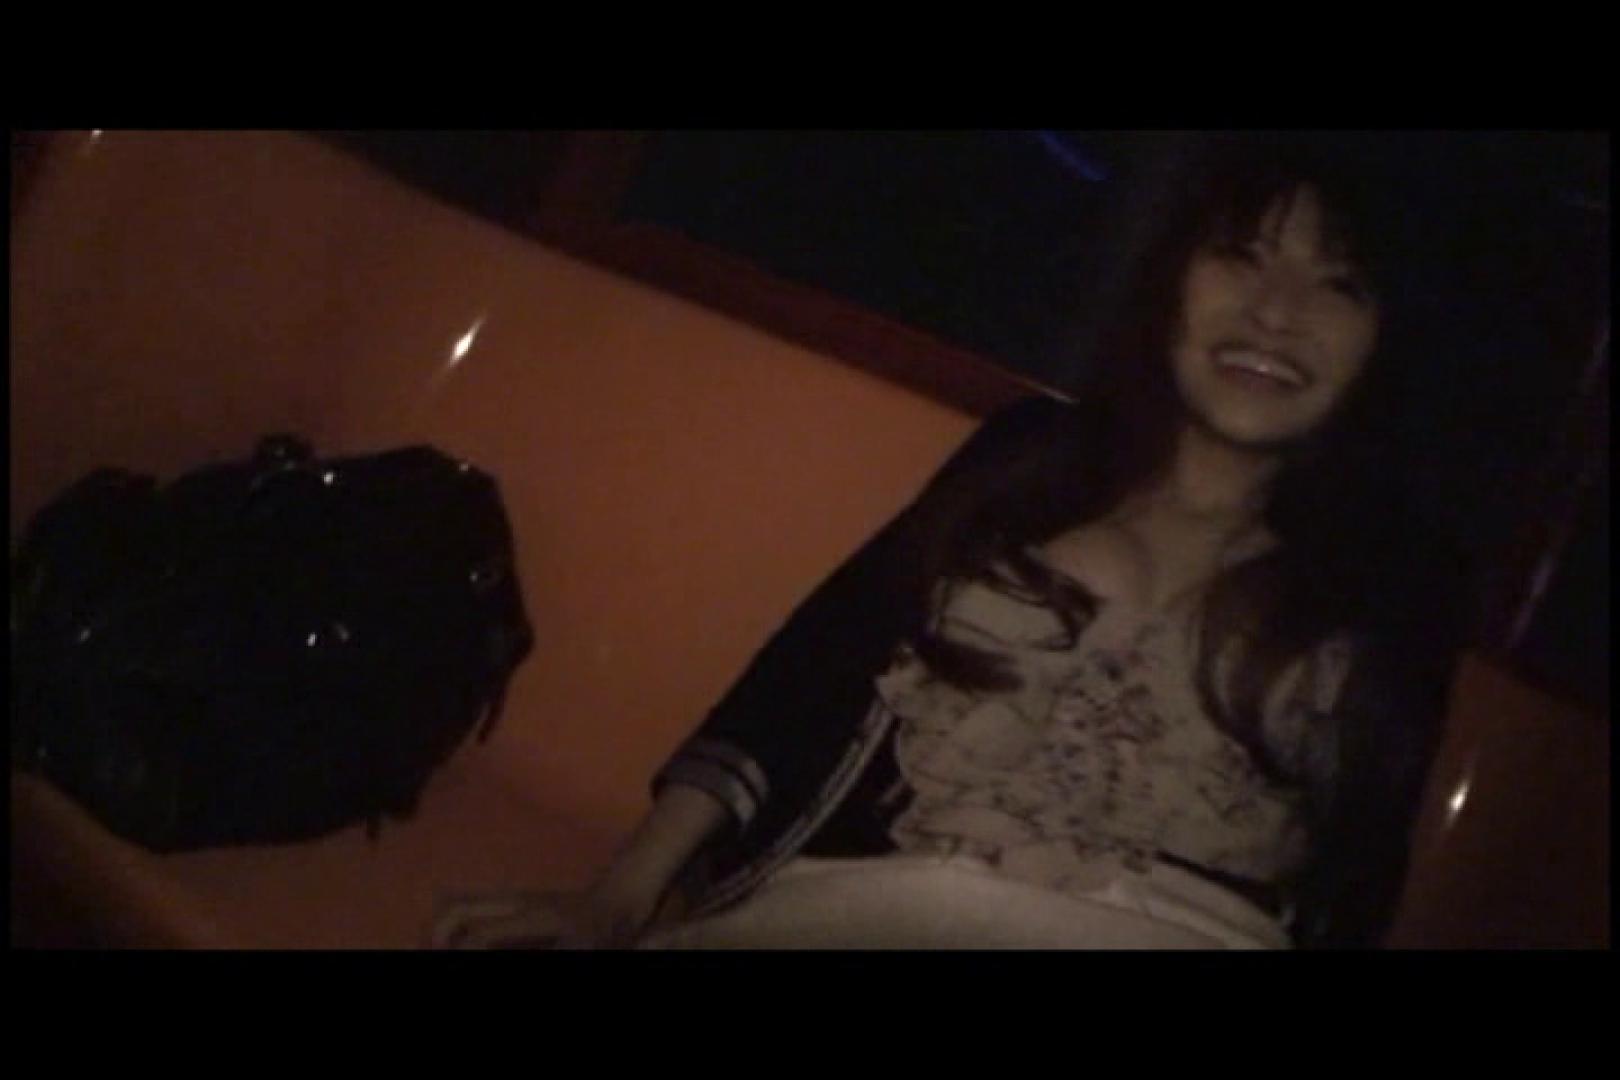 JDハンター全国ツアー vol.058 後編 女子大生のエロ動画 | 0  106PIX 33